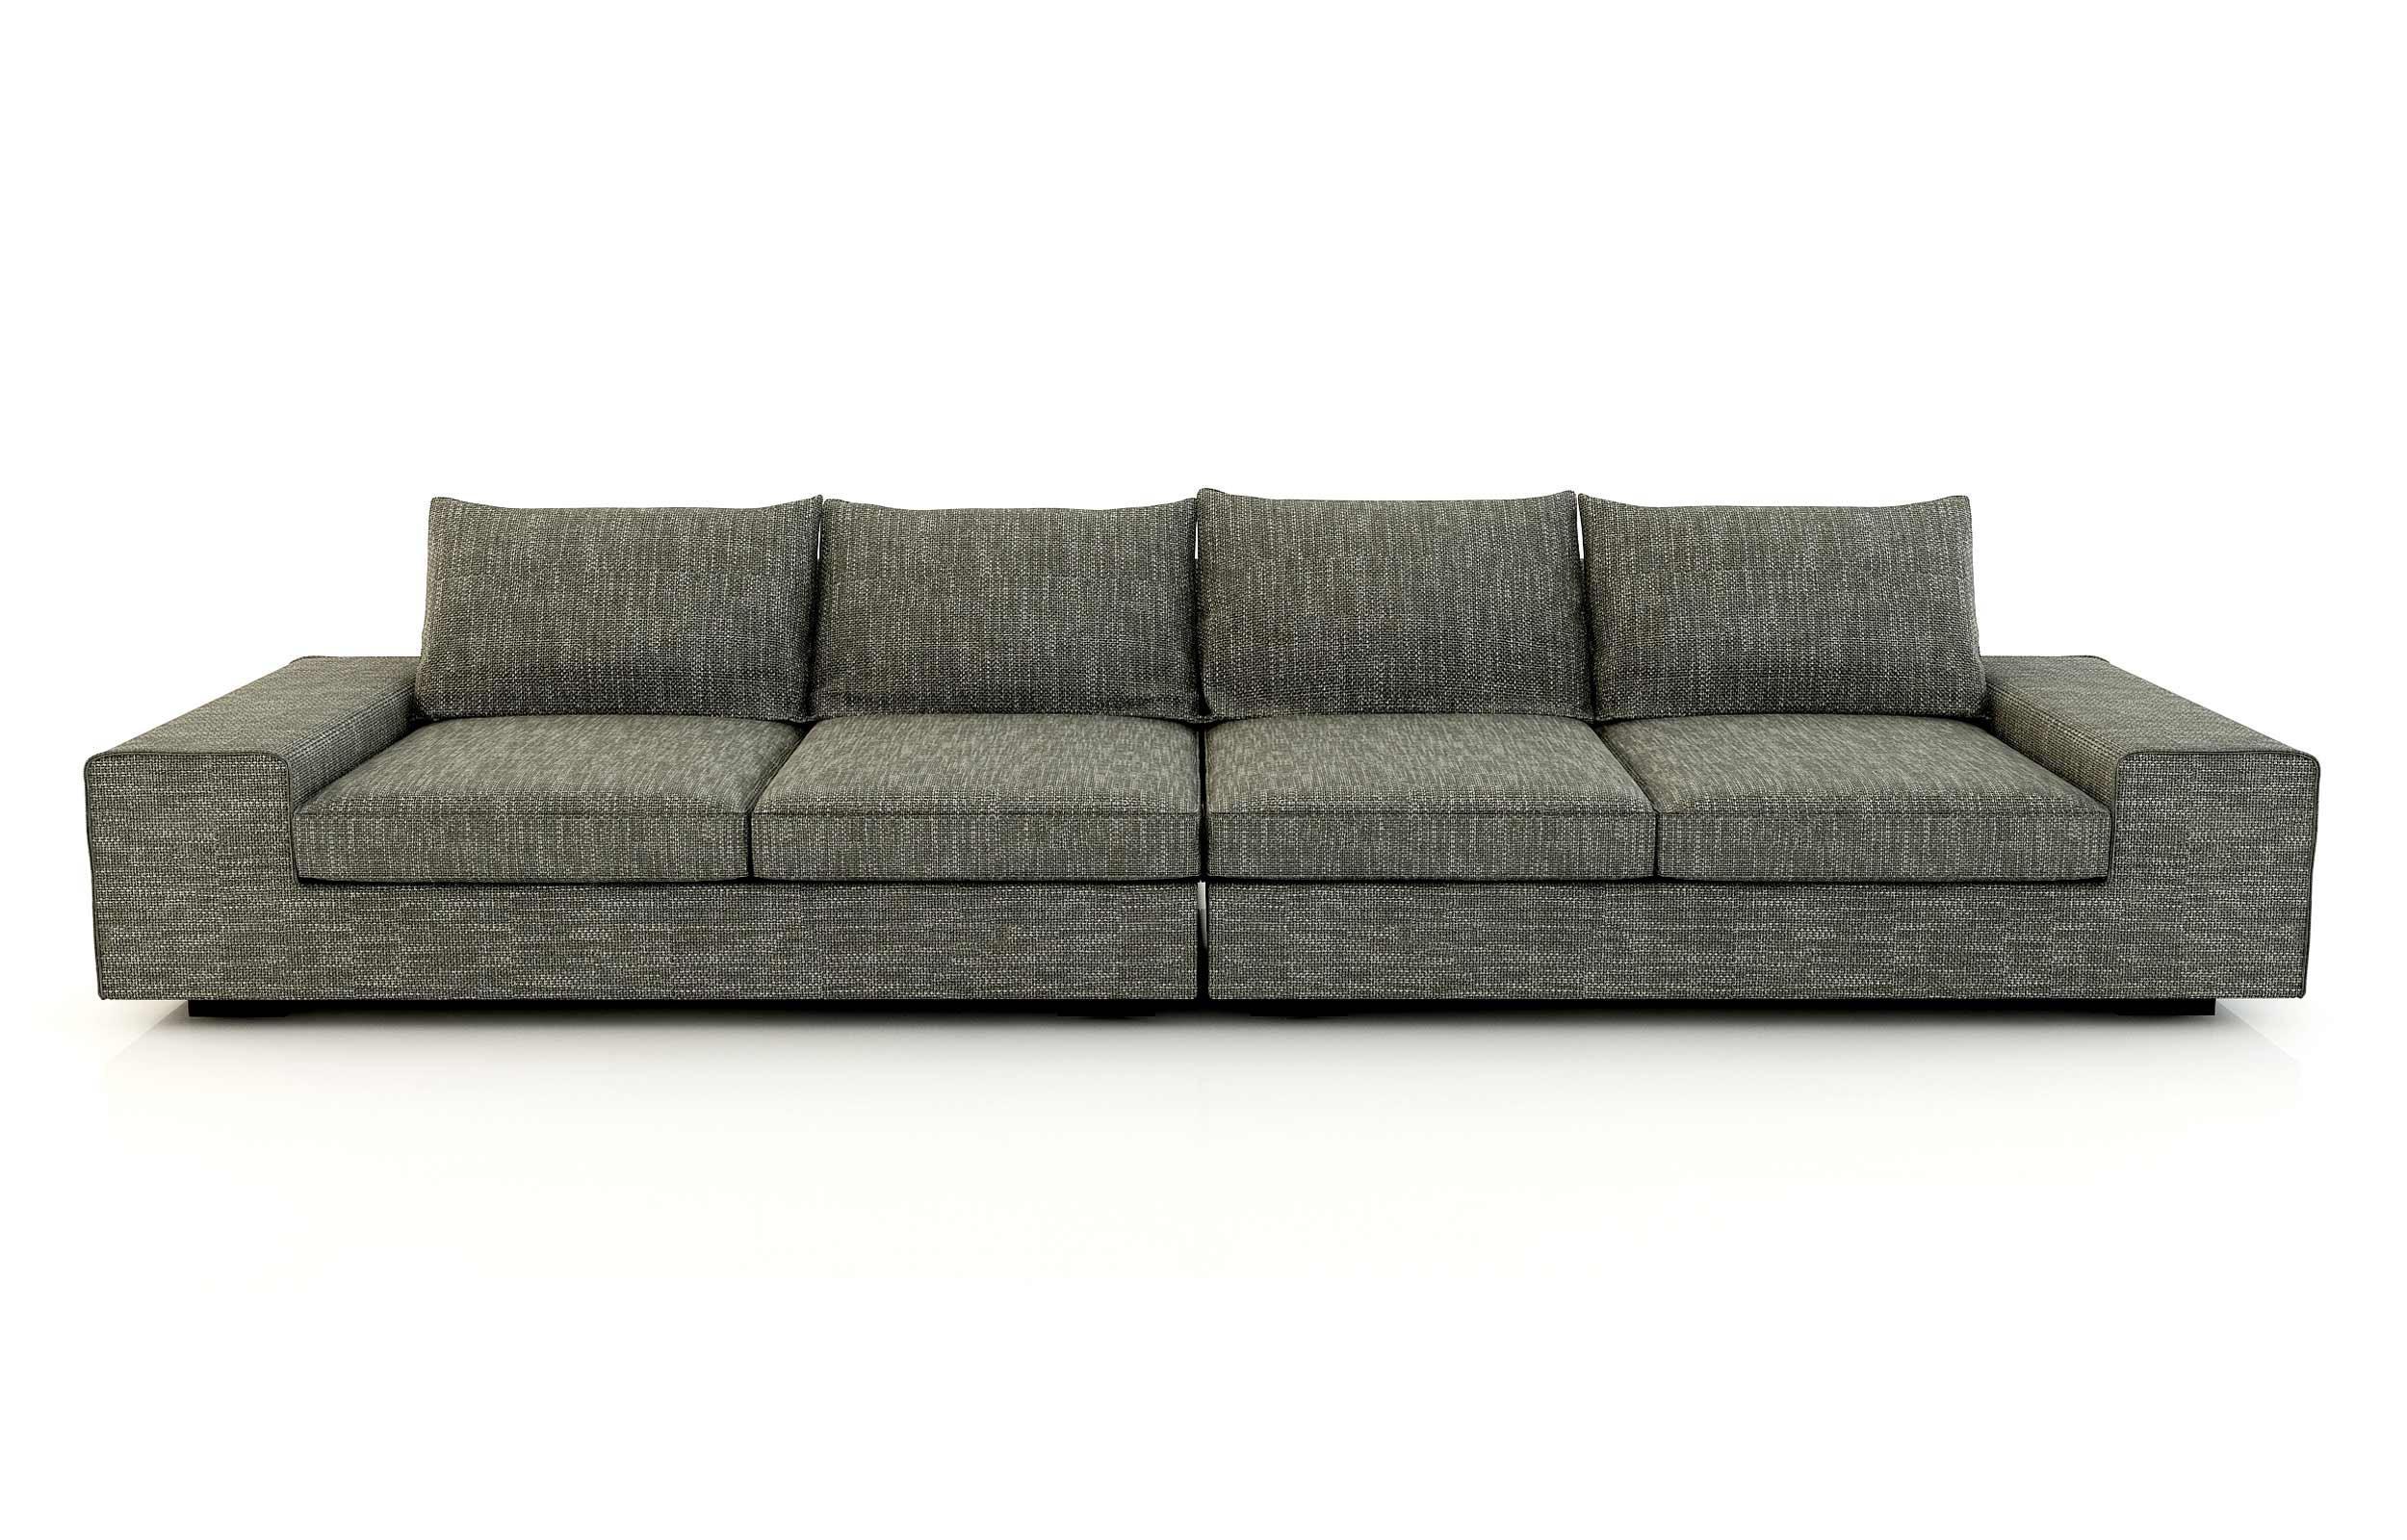 Blumen Sofa 2 Piece | Viesso With Regard To 2 Piece Sofas (Image 7 of 20)